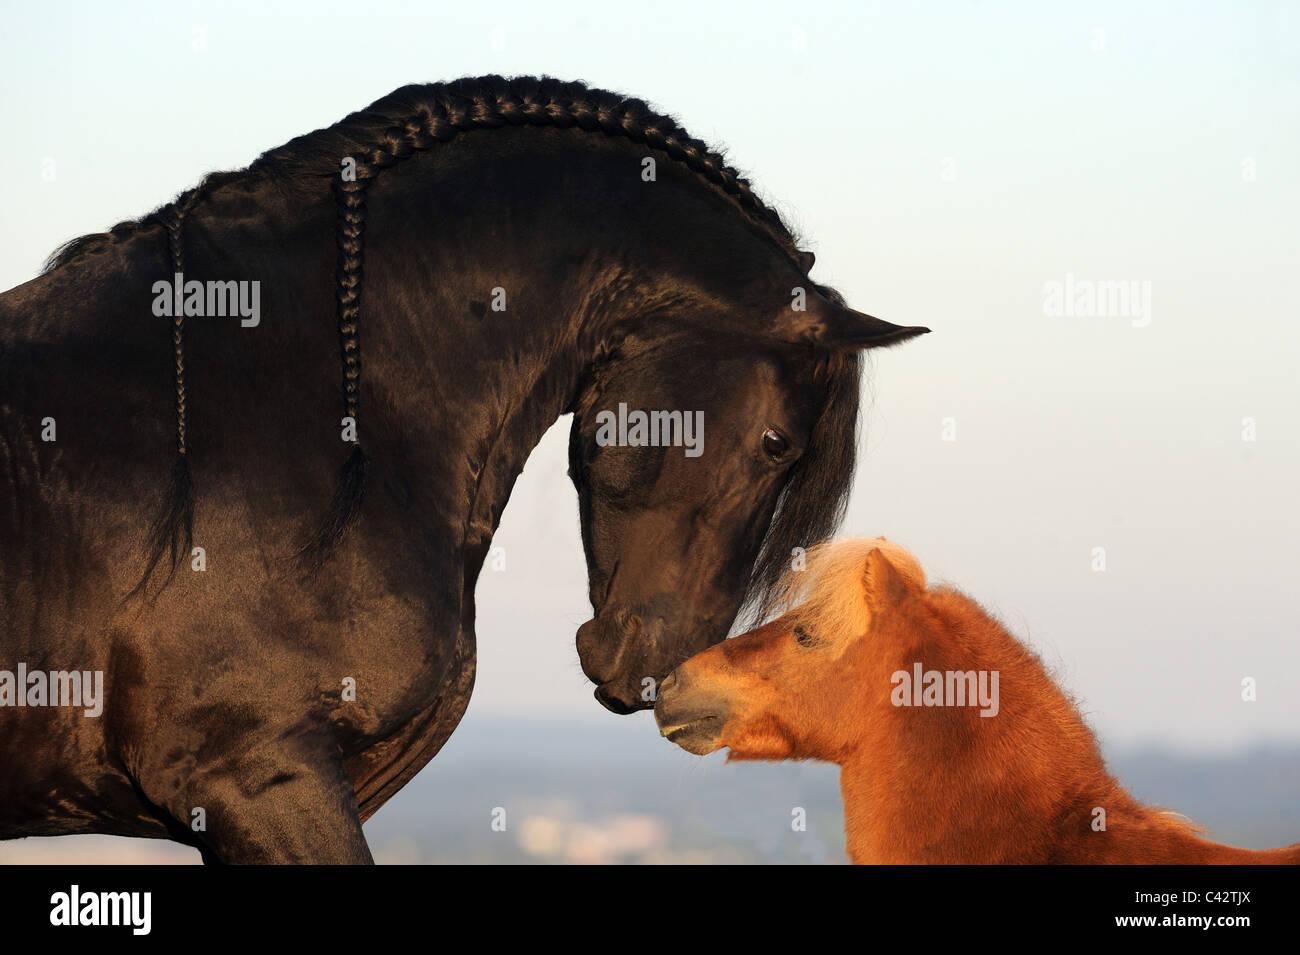 Friesian Horse (Equus ferus caballus). Stallion sniffing at its friend, a Miniature Shetland Pony. Germany. - Stock Image